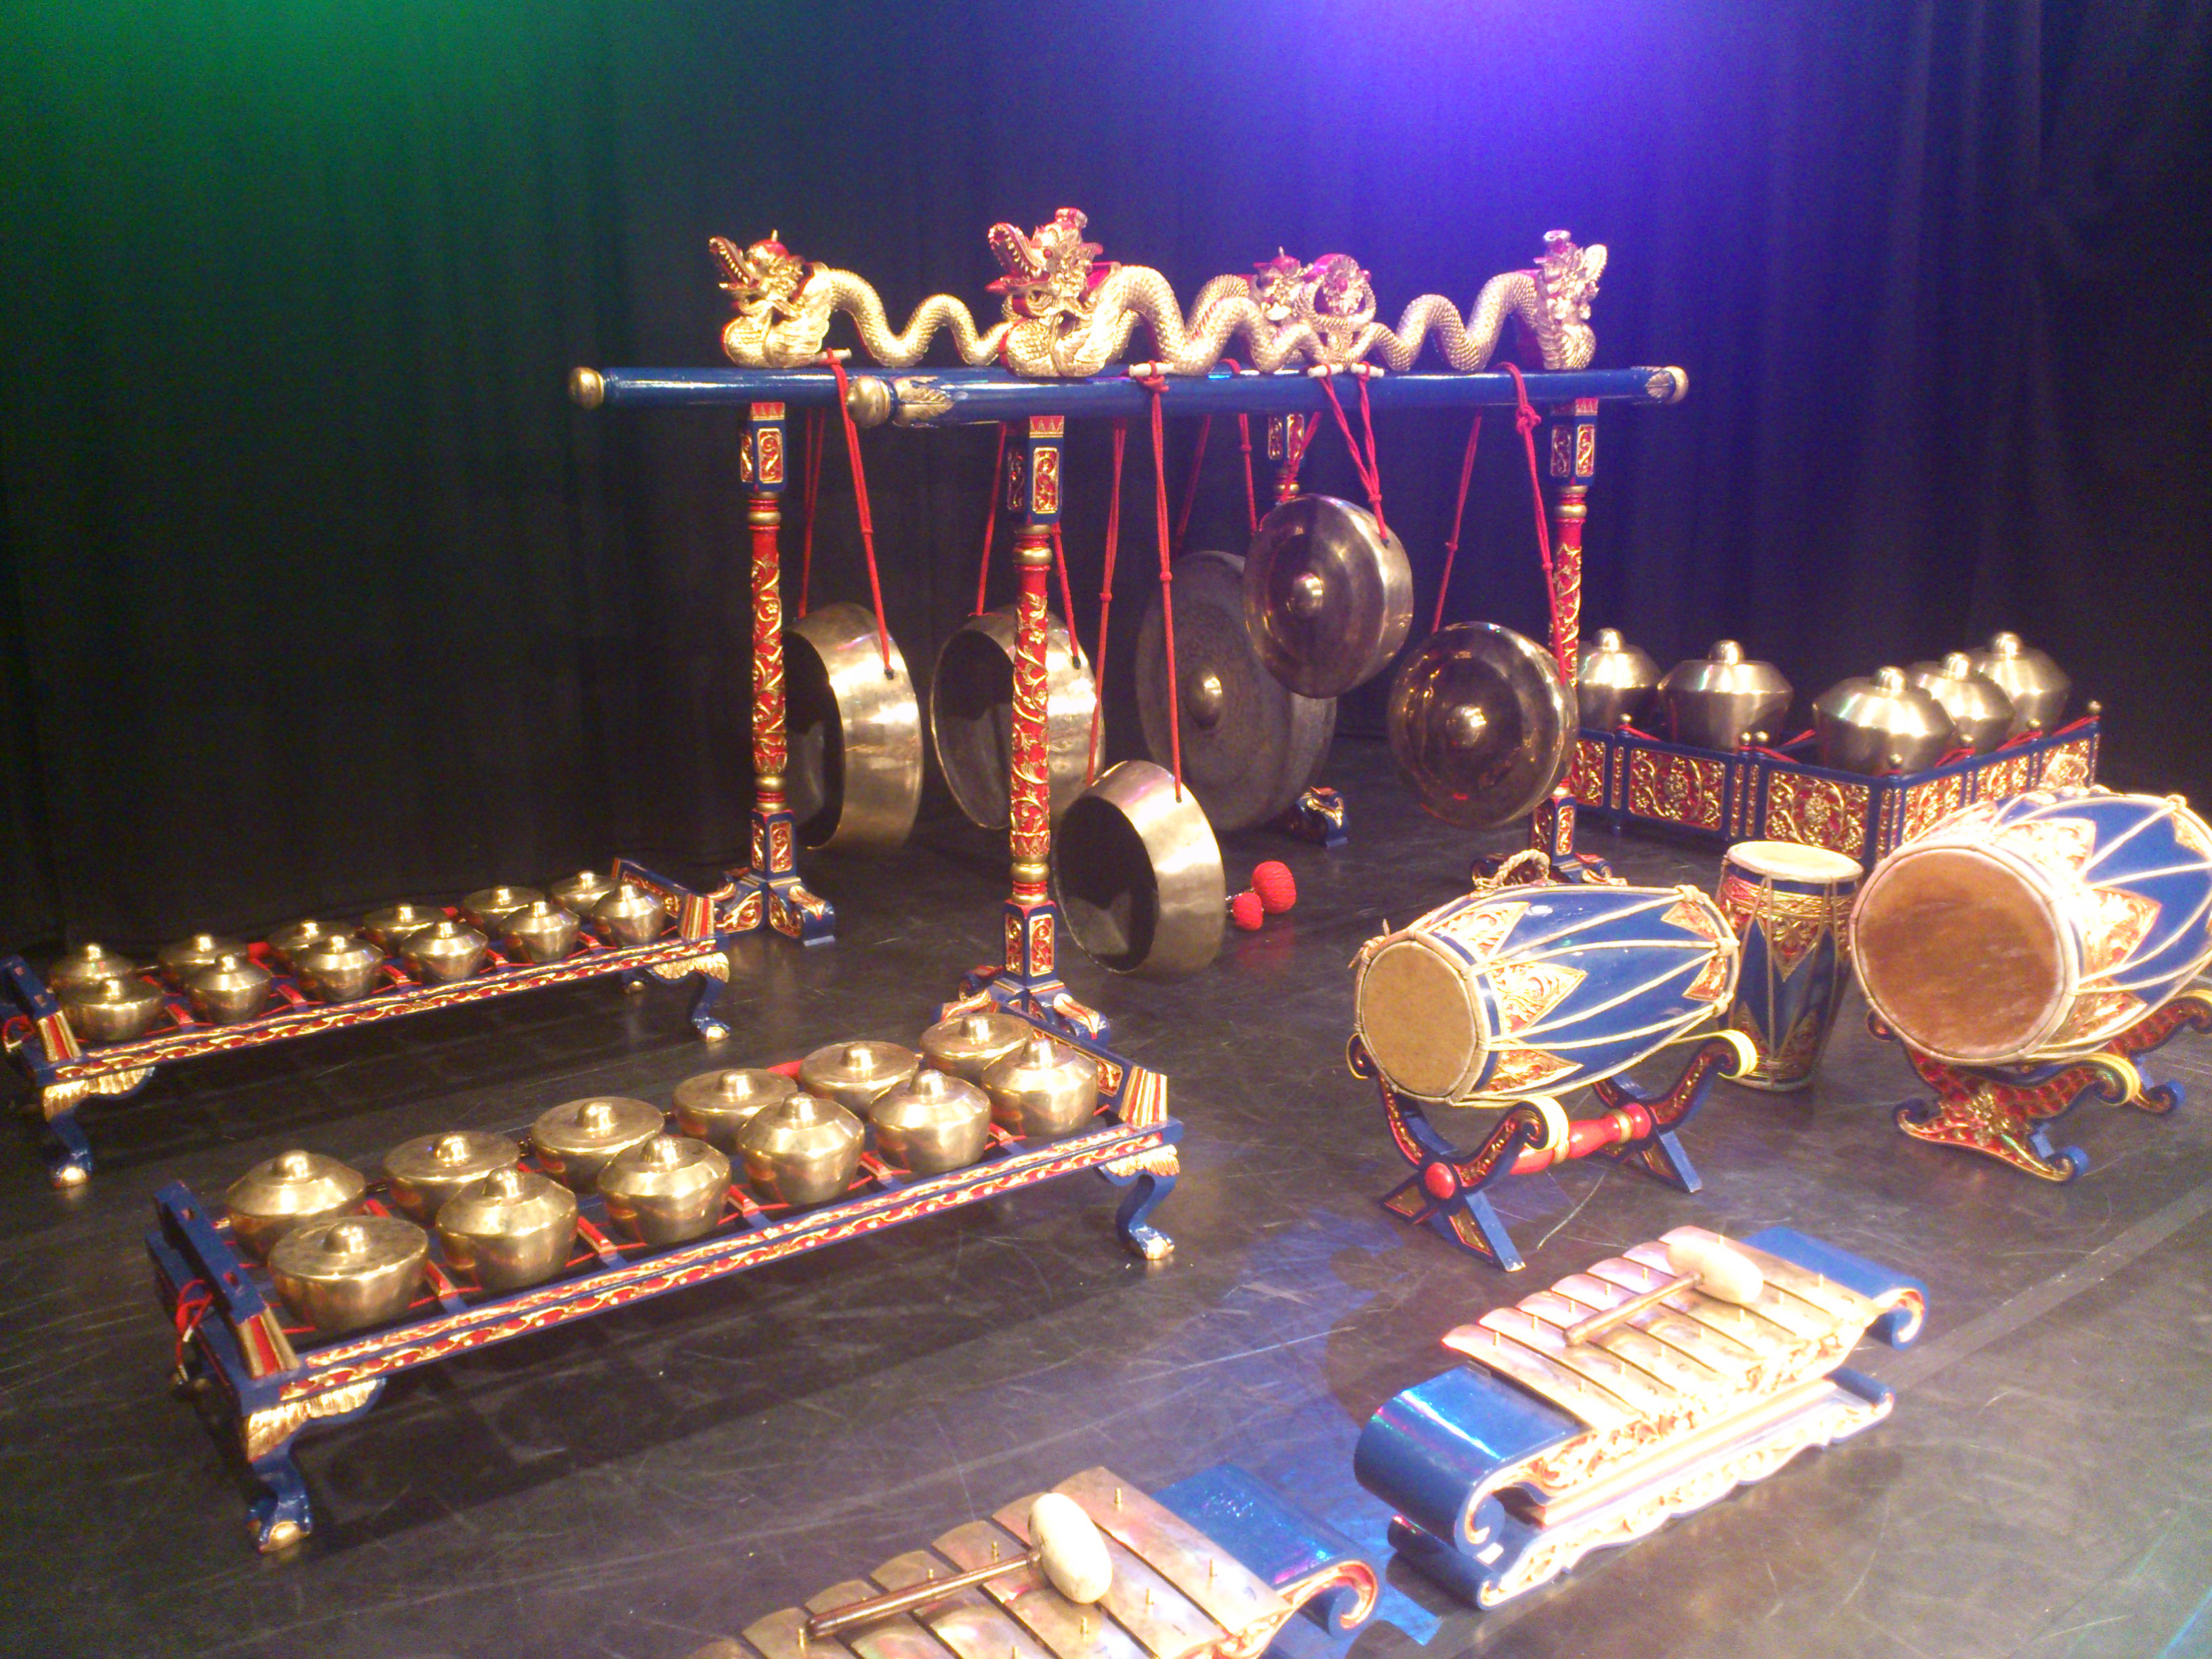 Gamelan music  drumming workshops,  Artbeat Projects